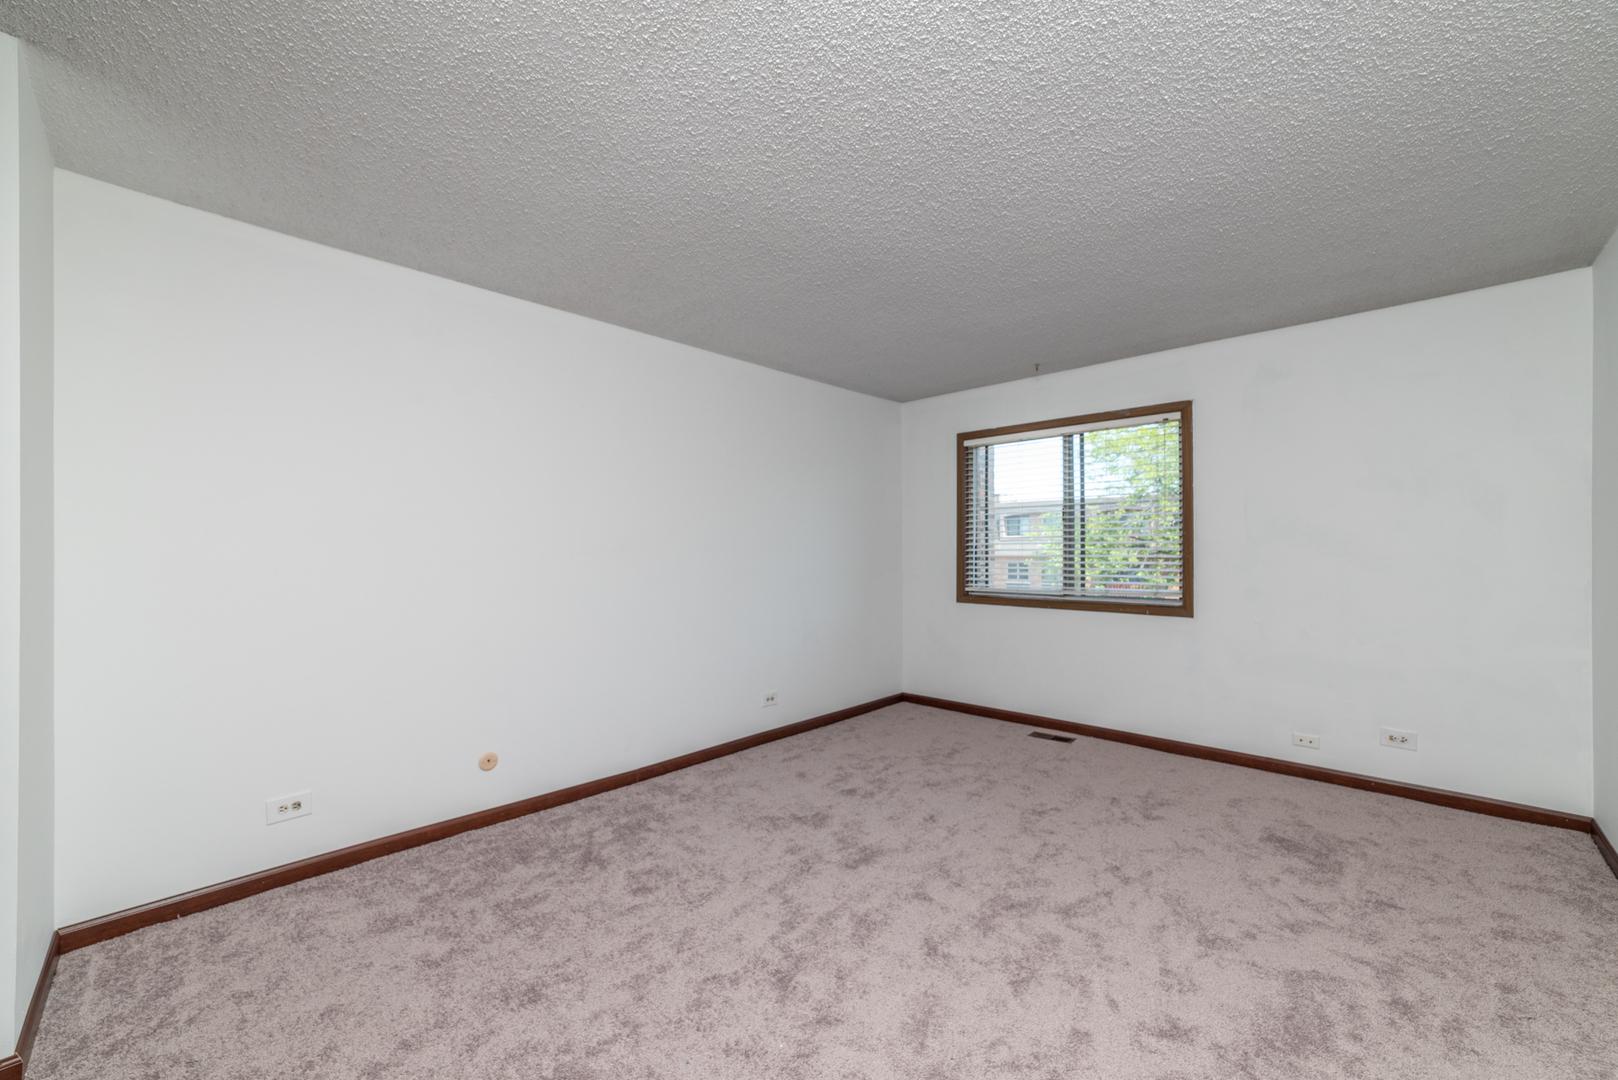 601 West Huntington Commons 109, Mount Prospect, Illinois, 60056